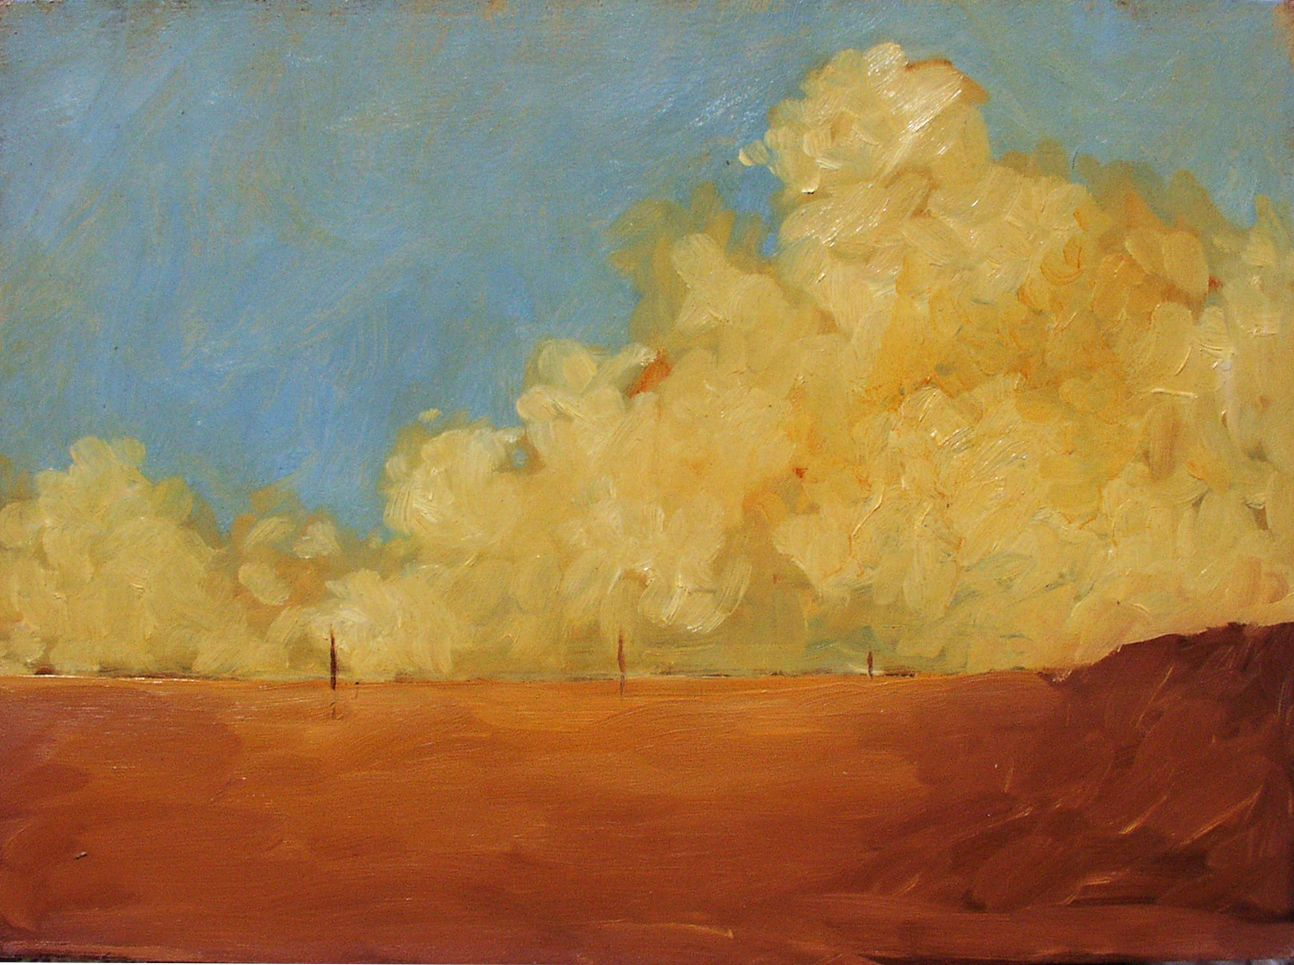 Modern Landscape Artists Contemporary Landscape Painting Paintings Famous Contemporary Landscape Painting Abstract Landscape Painting